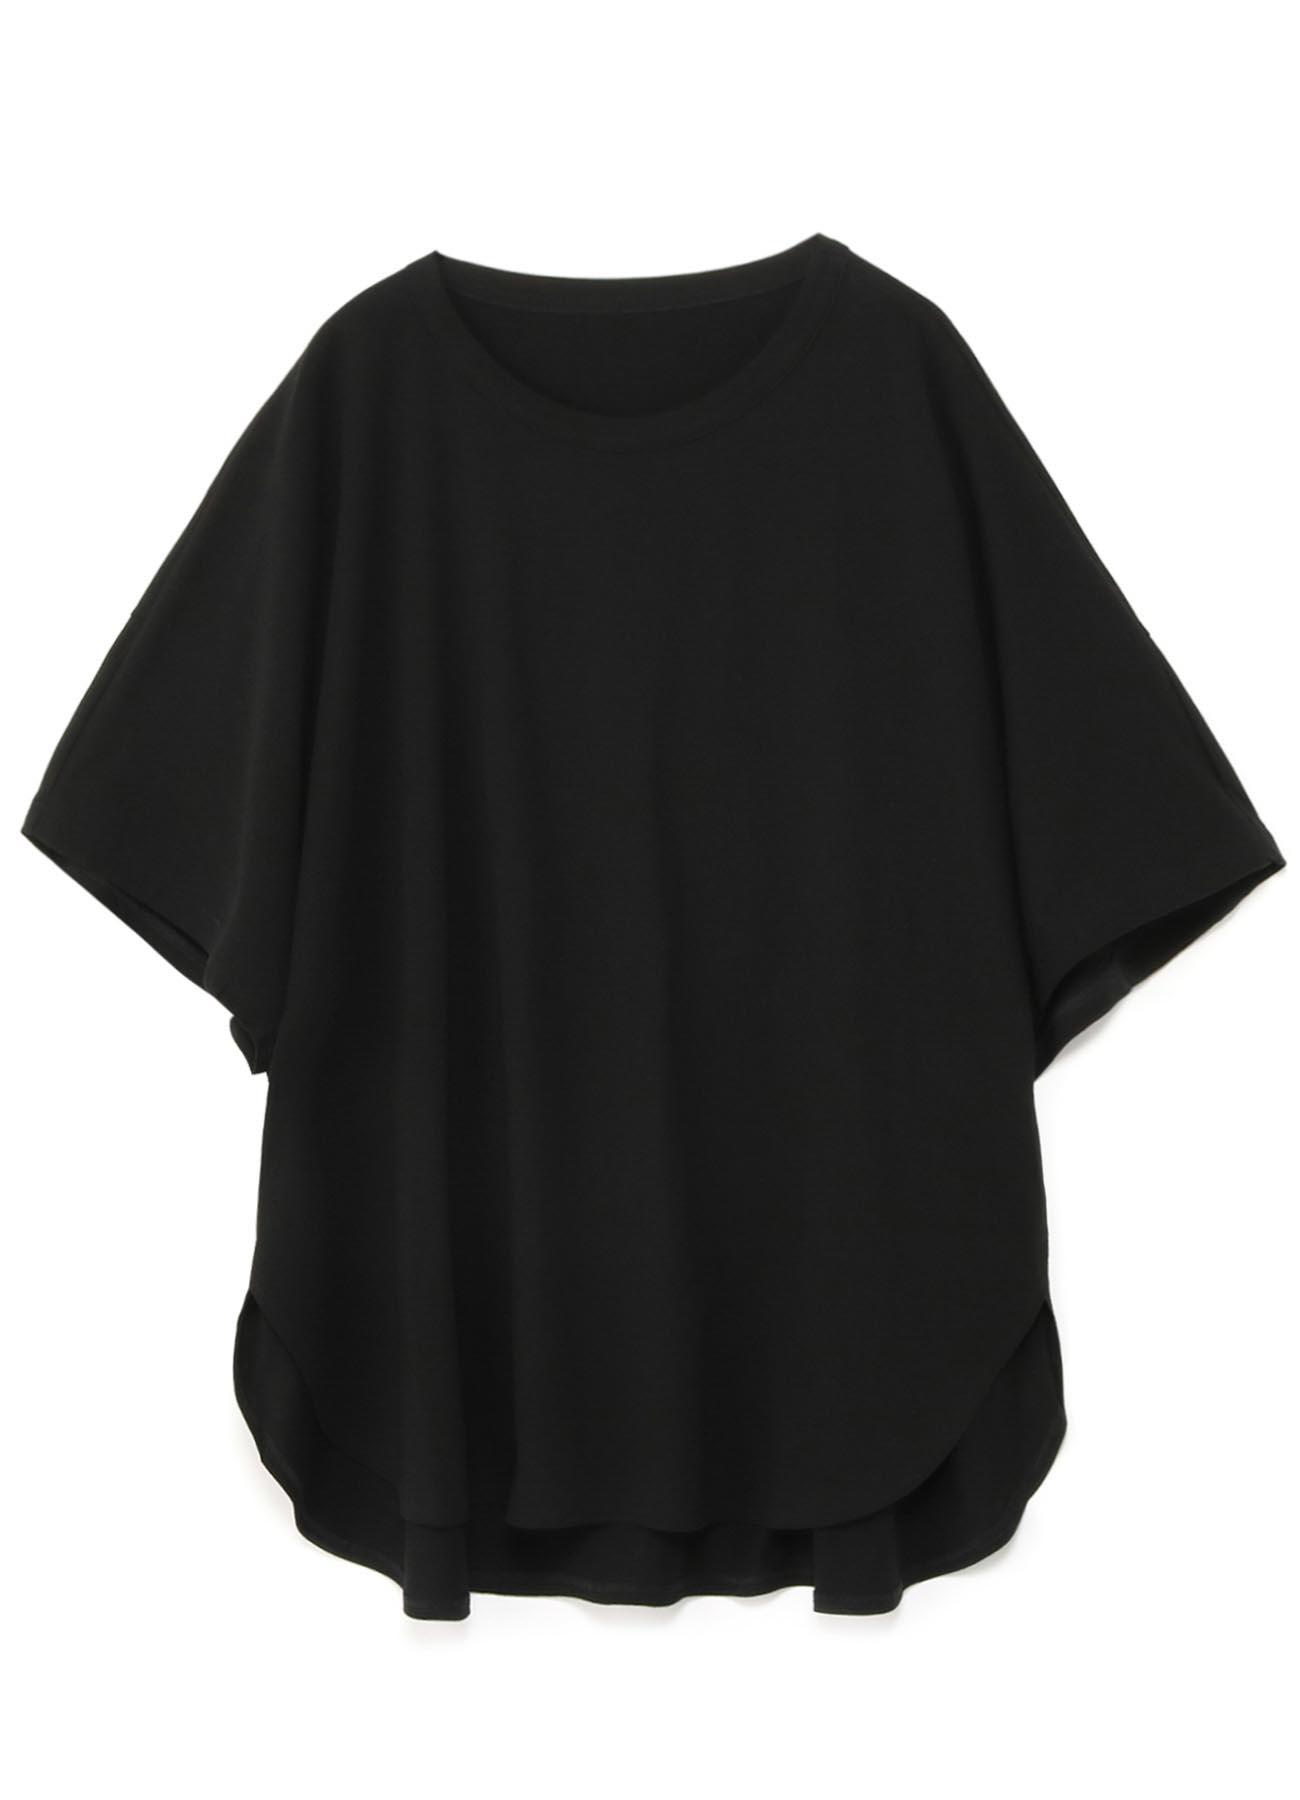 30/cotton Jersey Dolman Round Short Sleeves Cut Sew